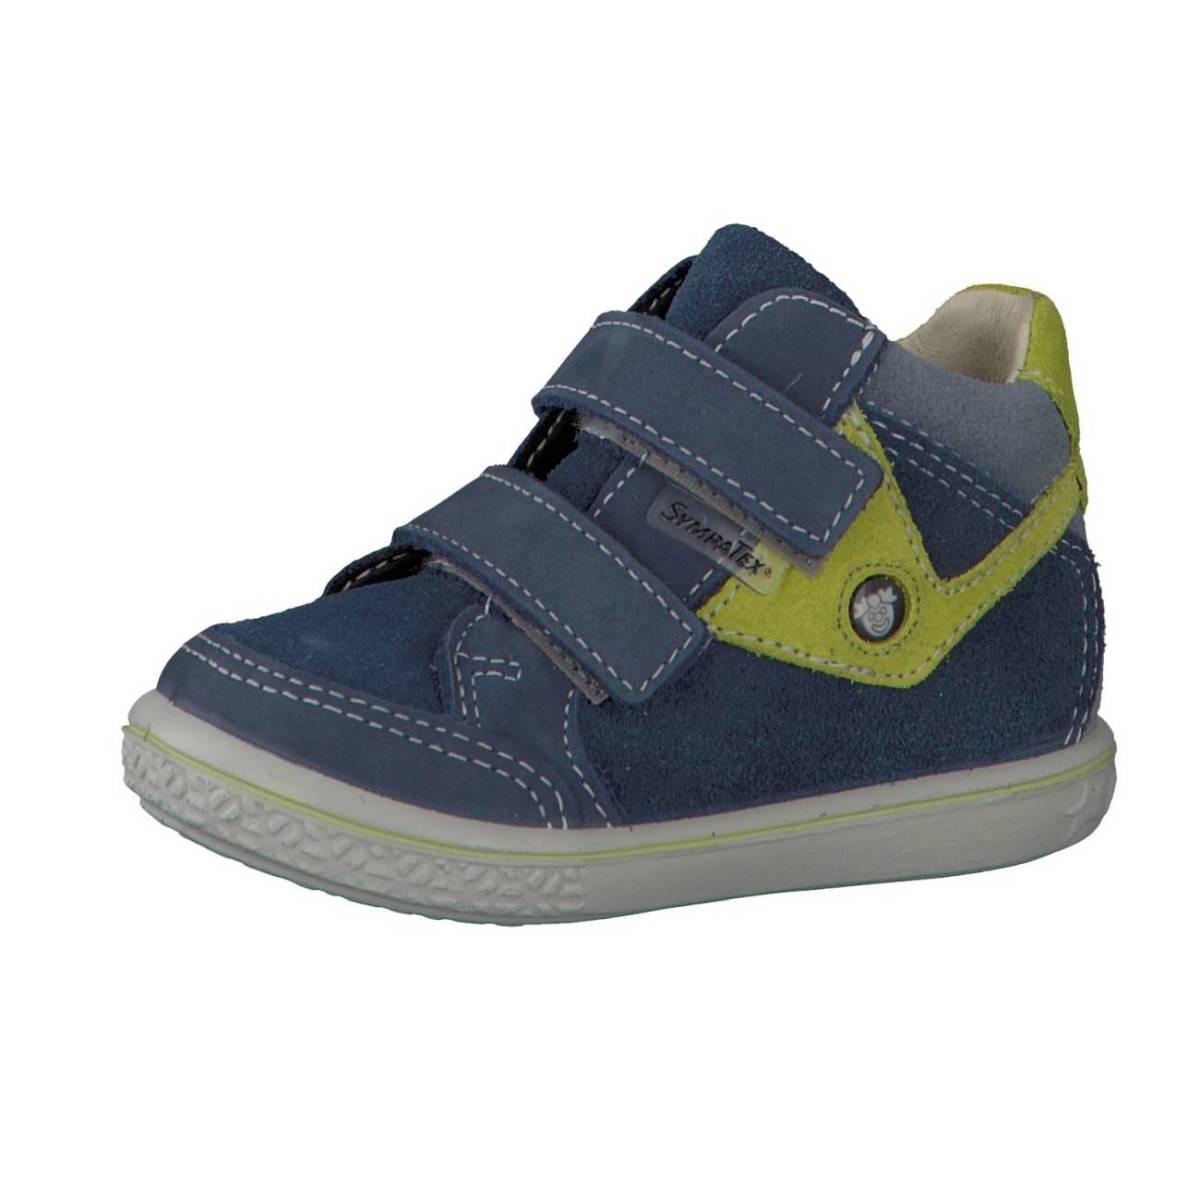 Ricosta Pepino Kimo blau grün reef lime Schuhe Jungen Mädchen Kinder